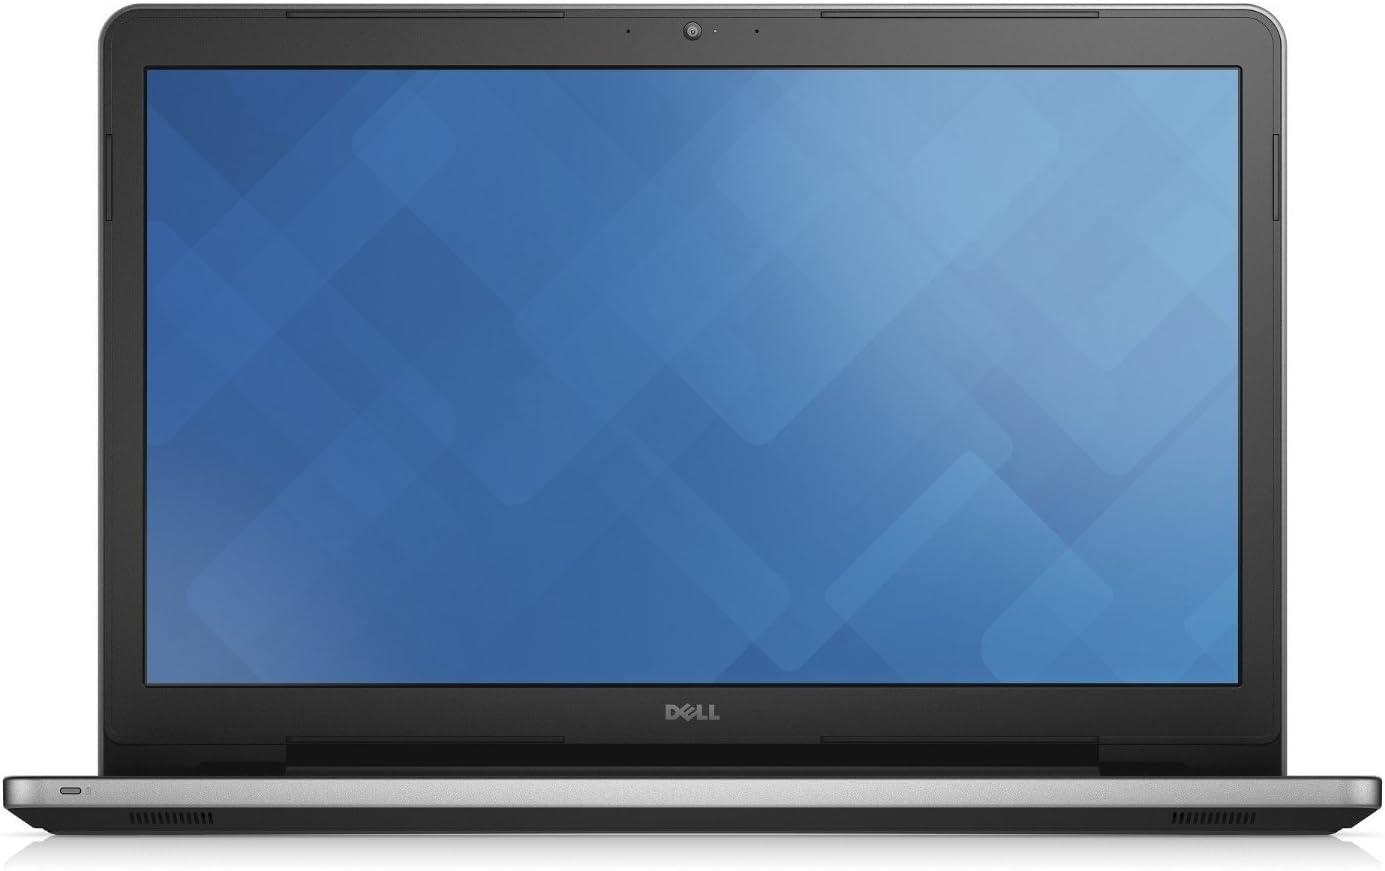 2015 Edition Dell Inspiron 17 5000 Series 17.3 Inch Laptop with with Windows 10 Professional, Intel Core i3-4005U, 4GB DDR3 RAM 500GB HDD, DVDRW, 802.11ac + Bluetooth 4.0, Full Size Keyboard